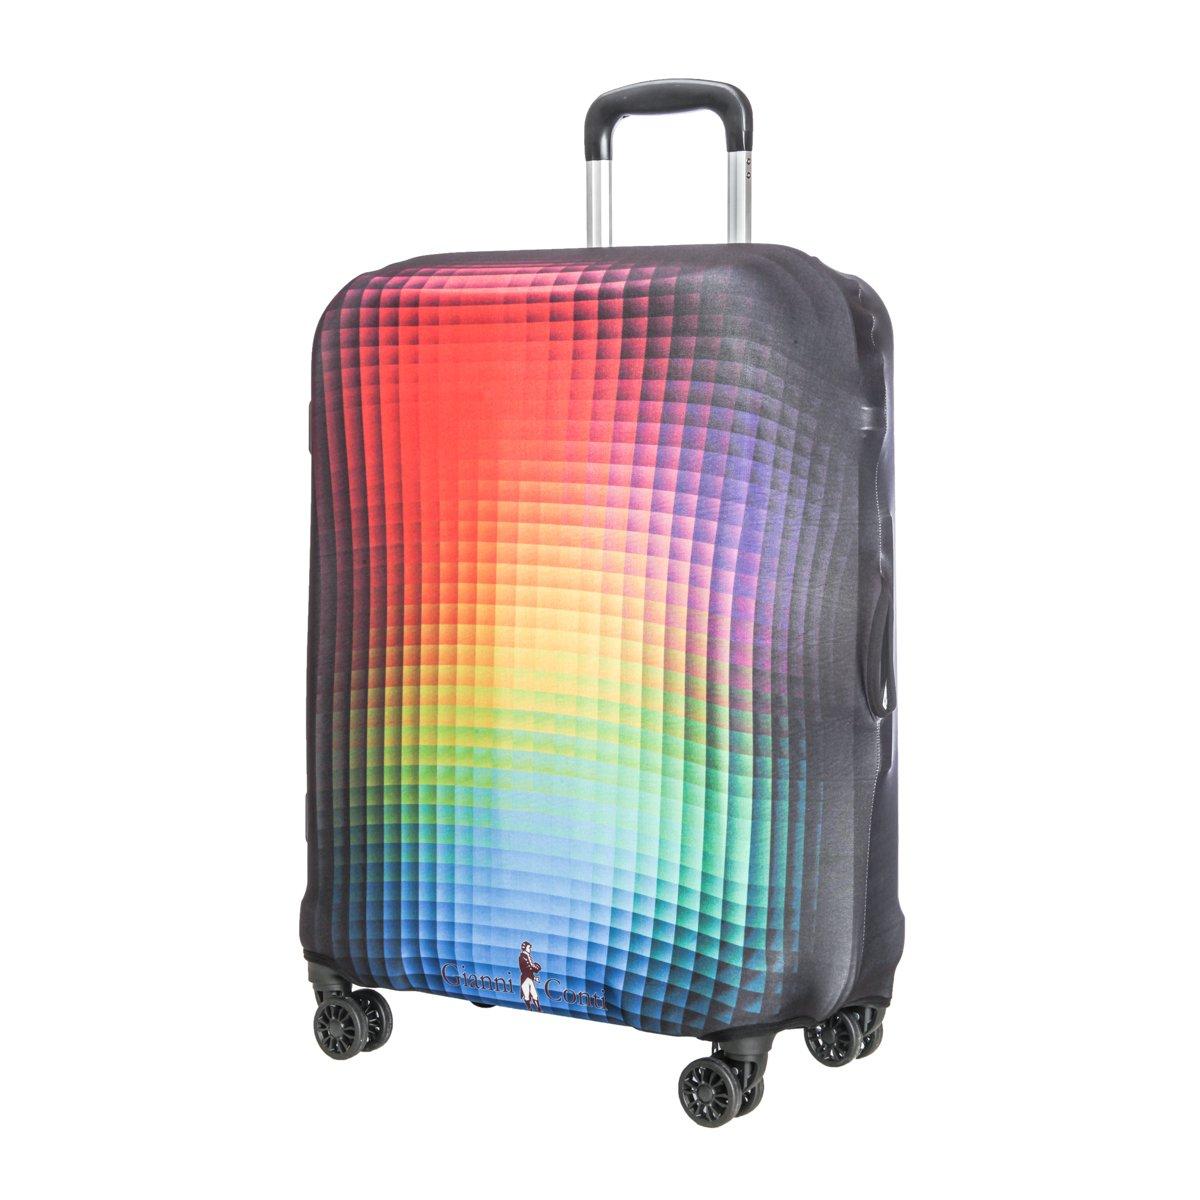 Защитное покрытие для чемодана Gianni Conti 9039 S.